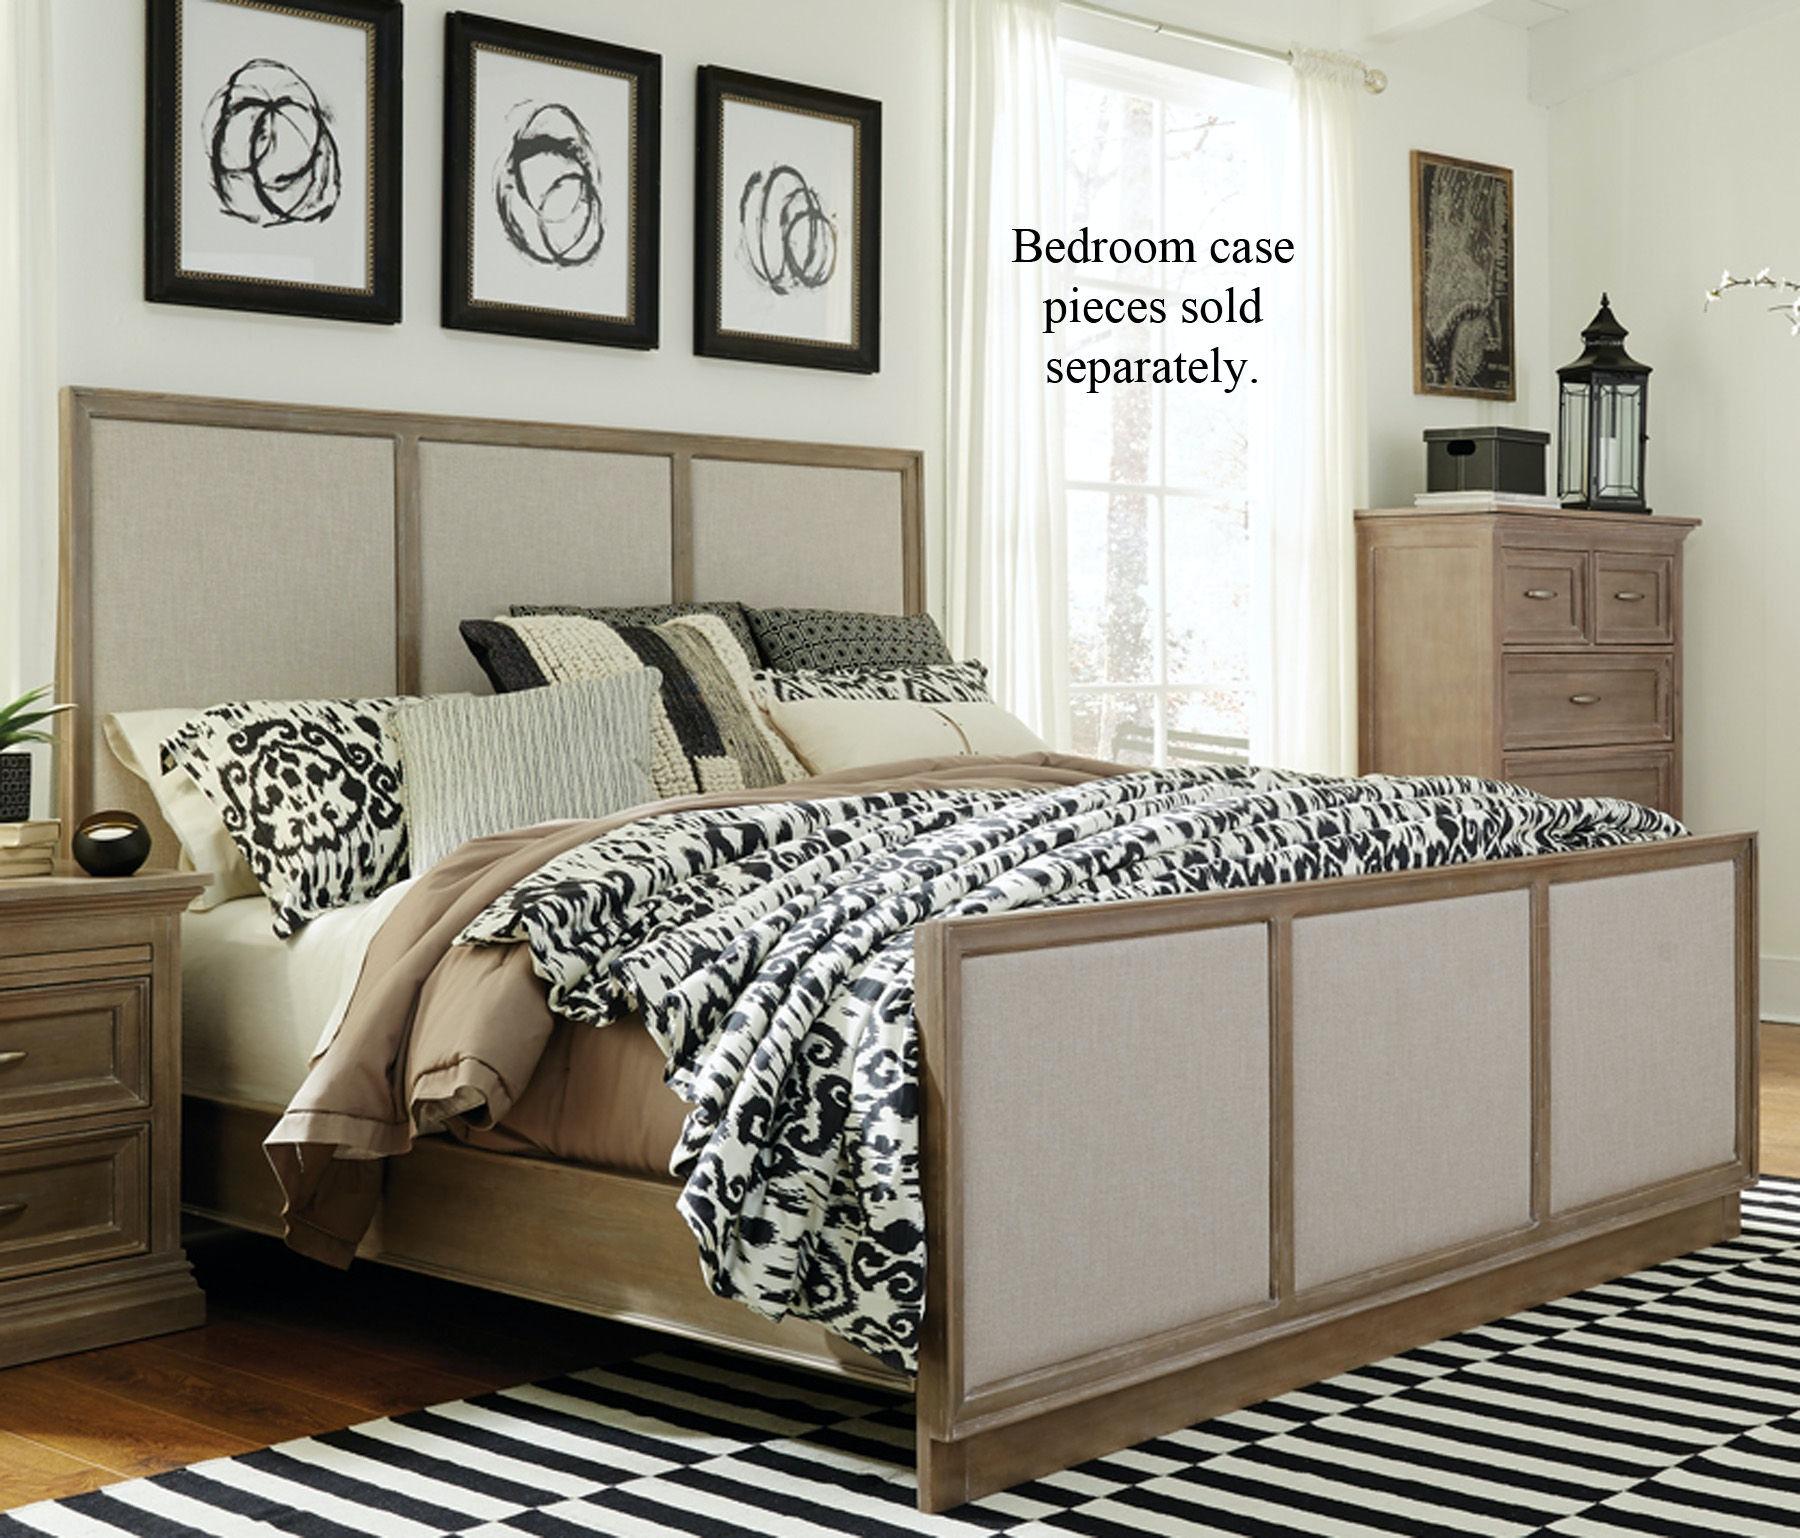 john thomas bedroom king upholstered bed in taupe gray bd09 301kh rh ncfurniture com